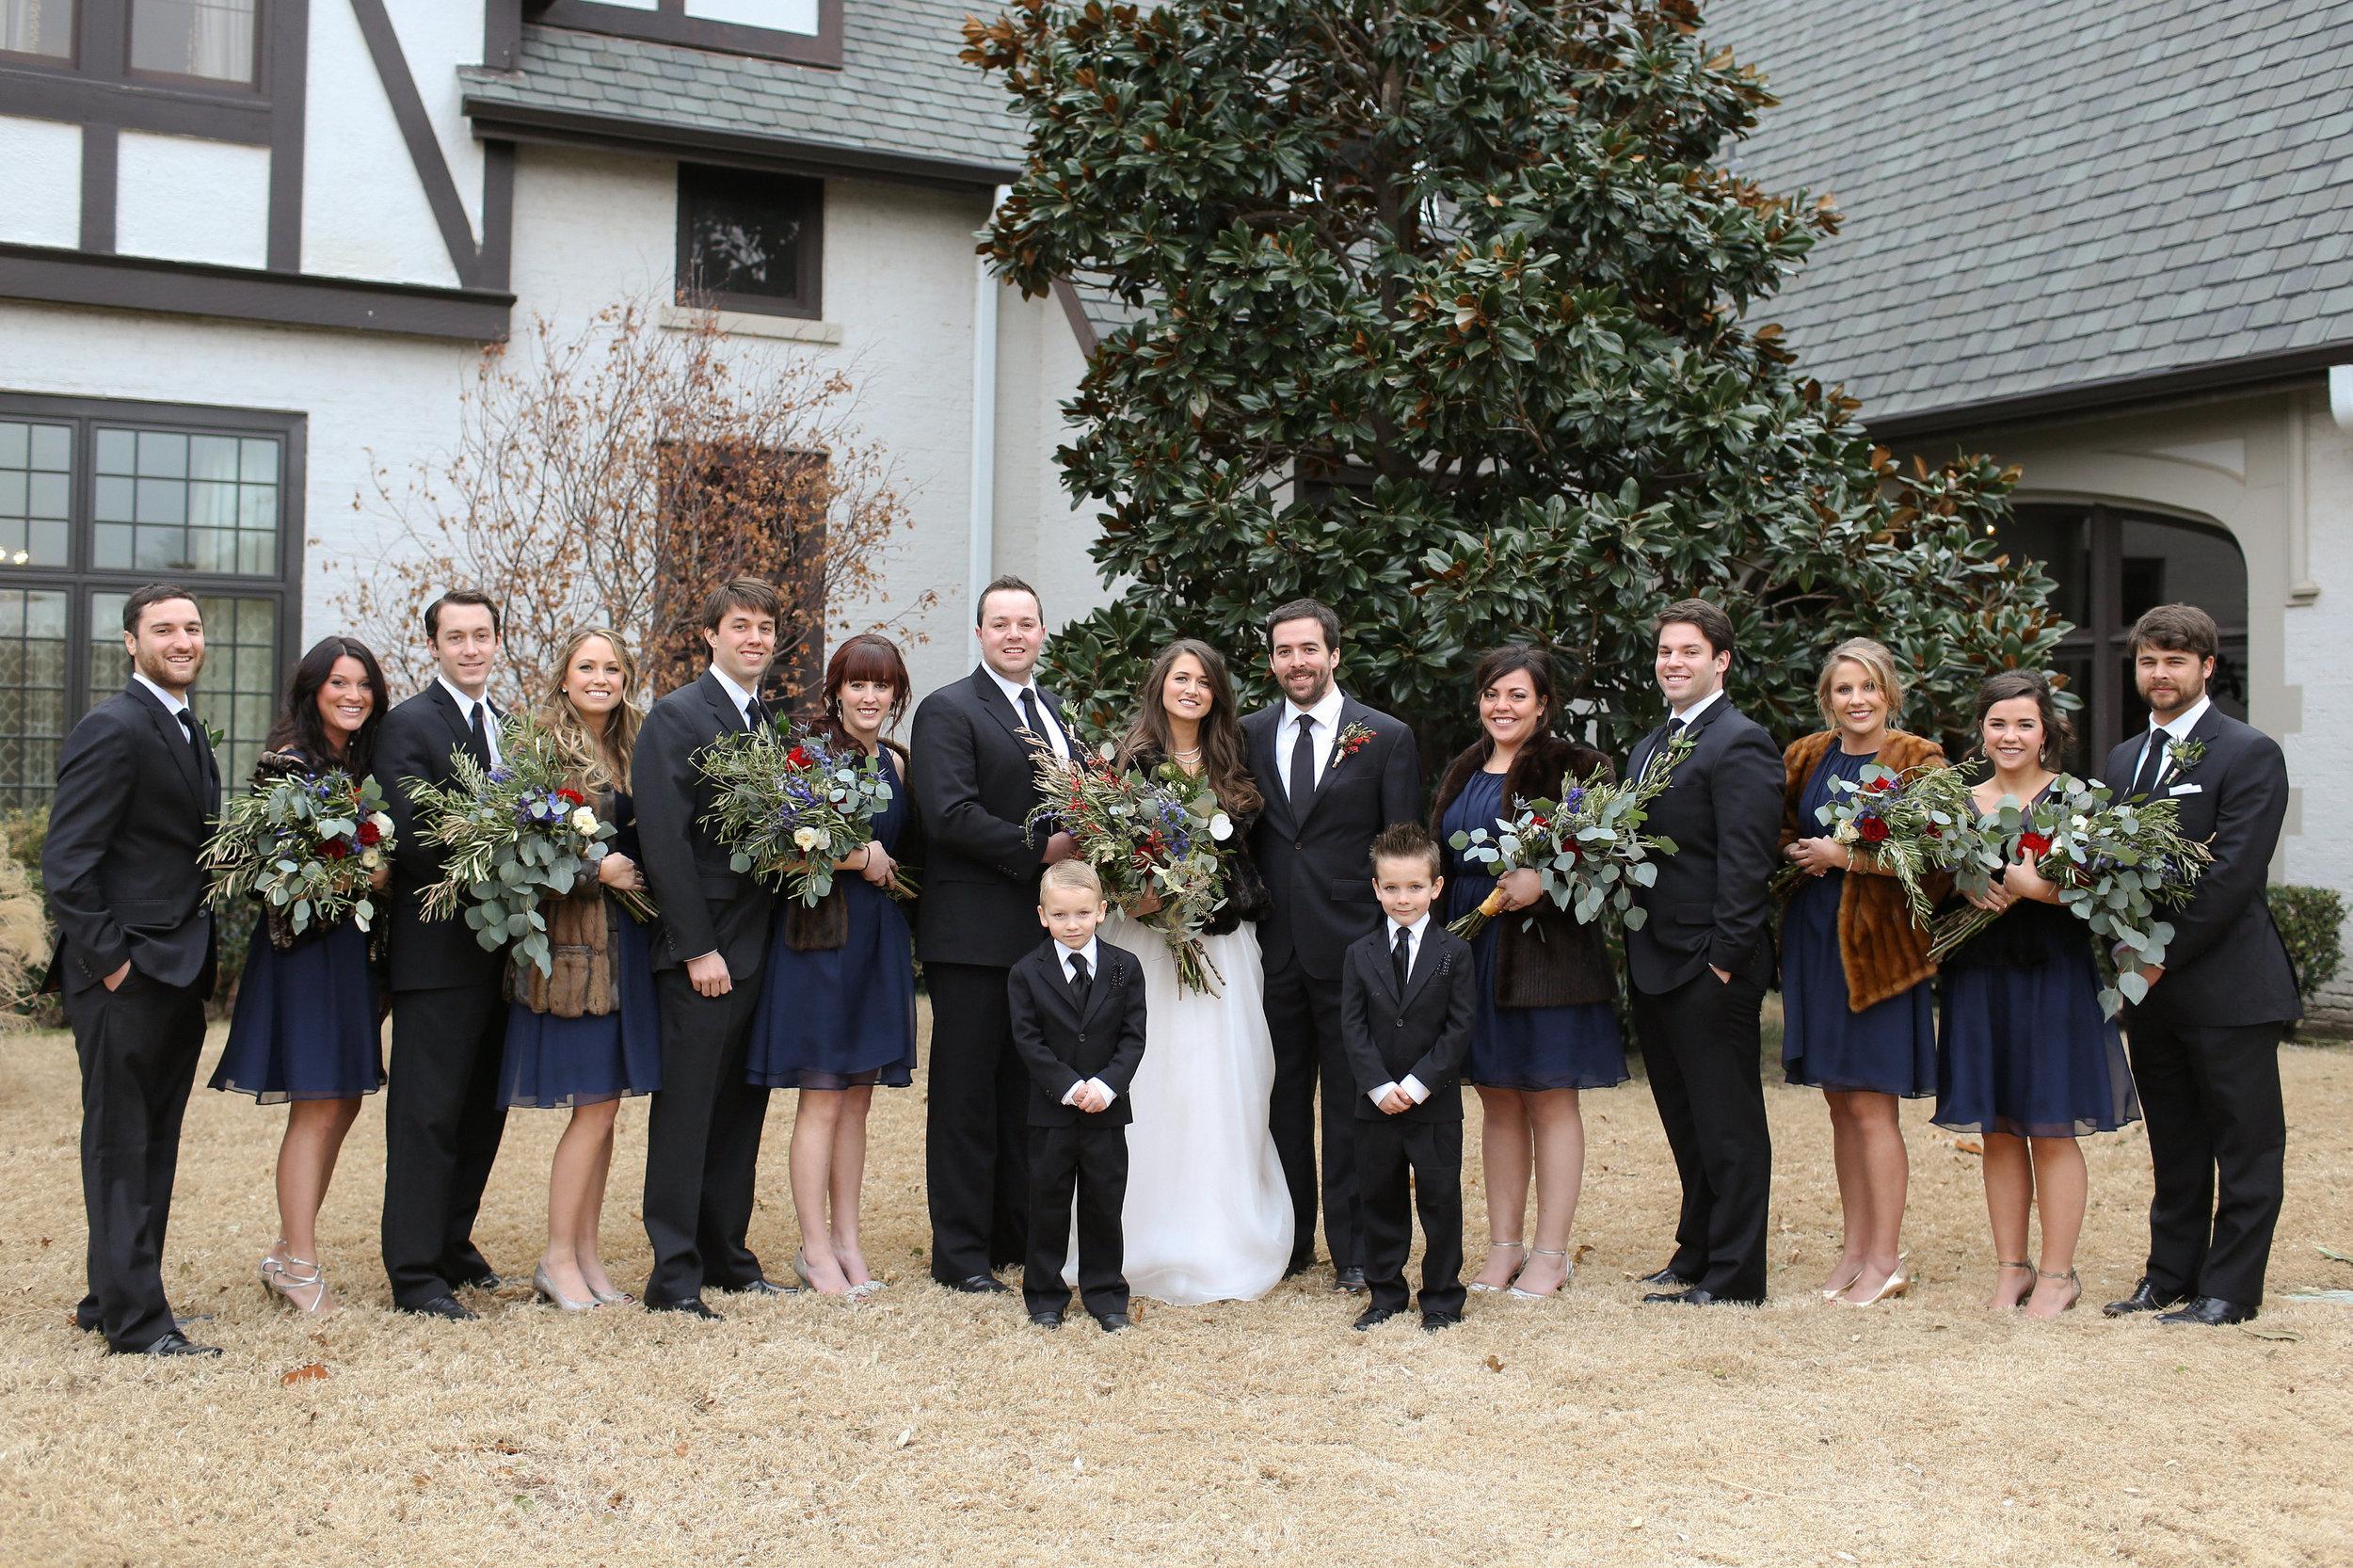 Aaron_Snow_Photography_Dick-Jordan_Wedding_WeddingParty.001.jpg